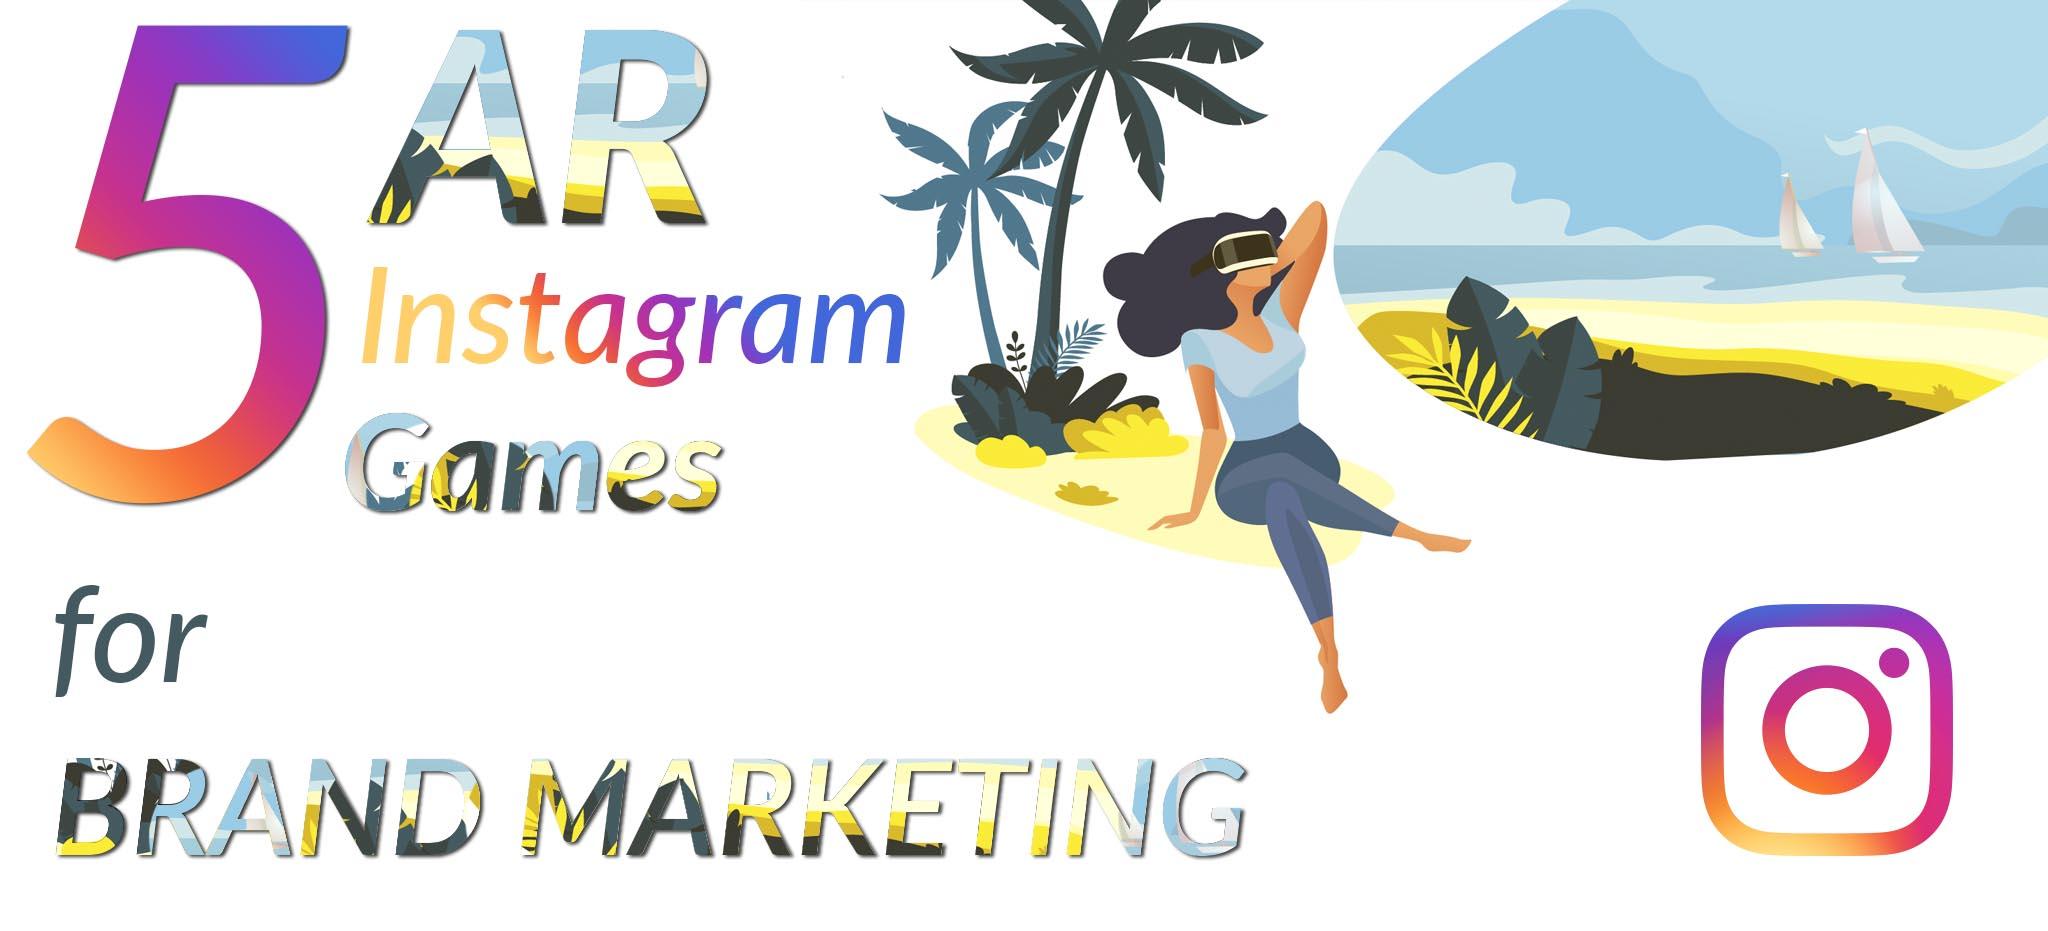 5 AR Instagram Games Brand Marketing